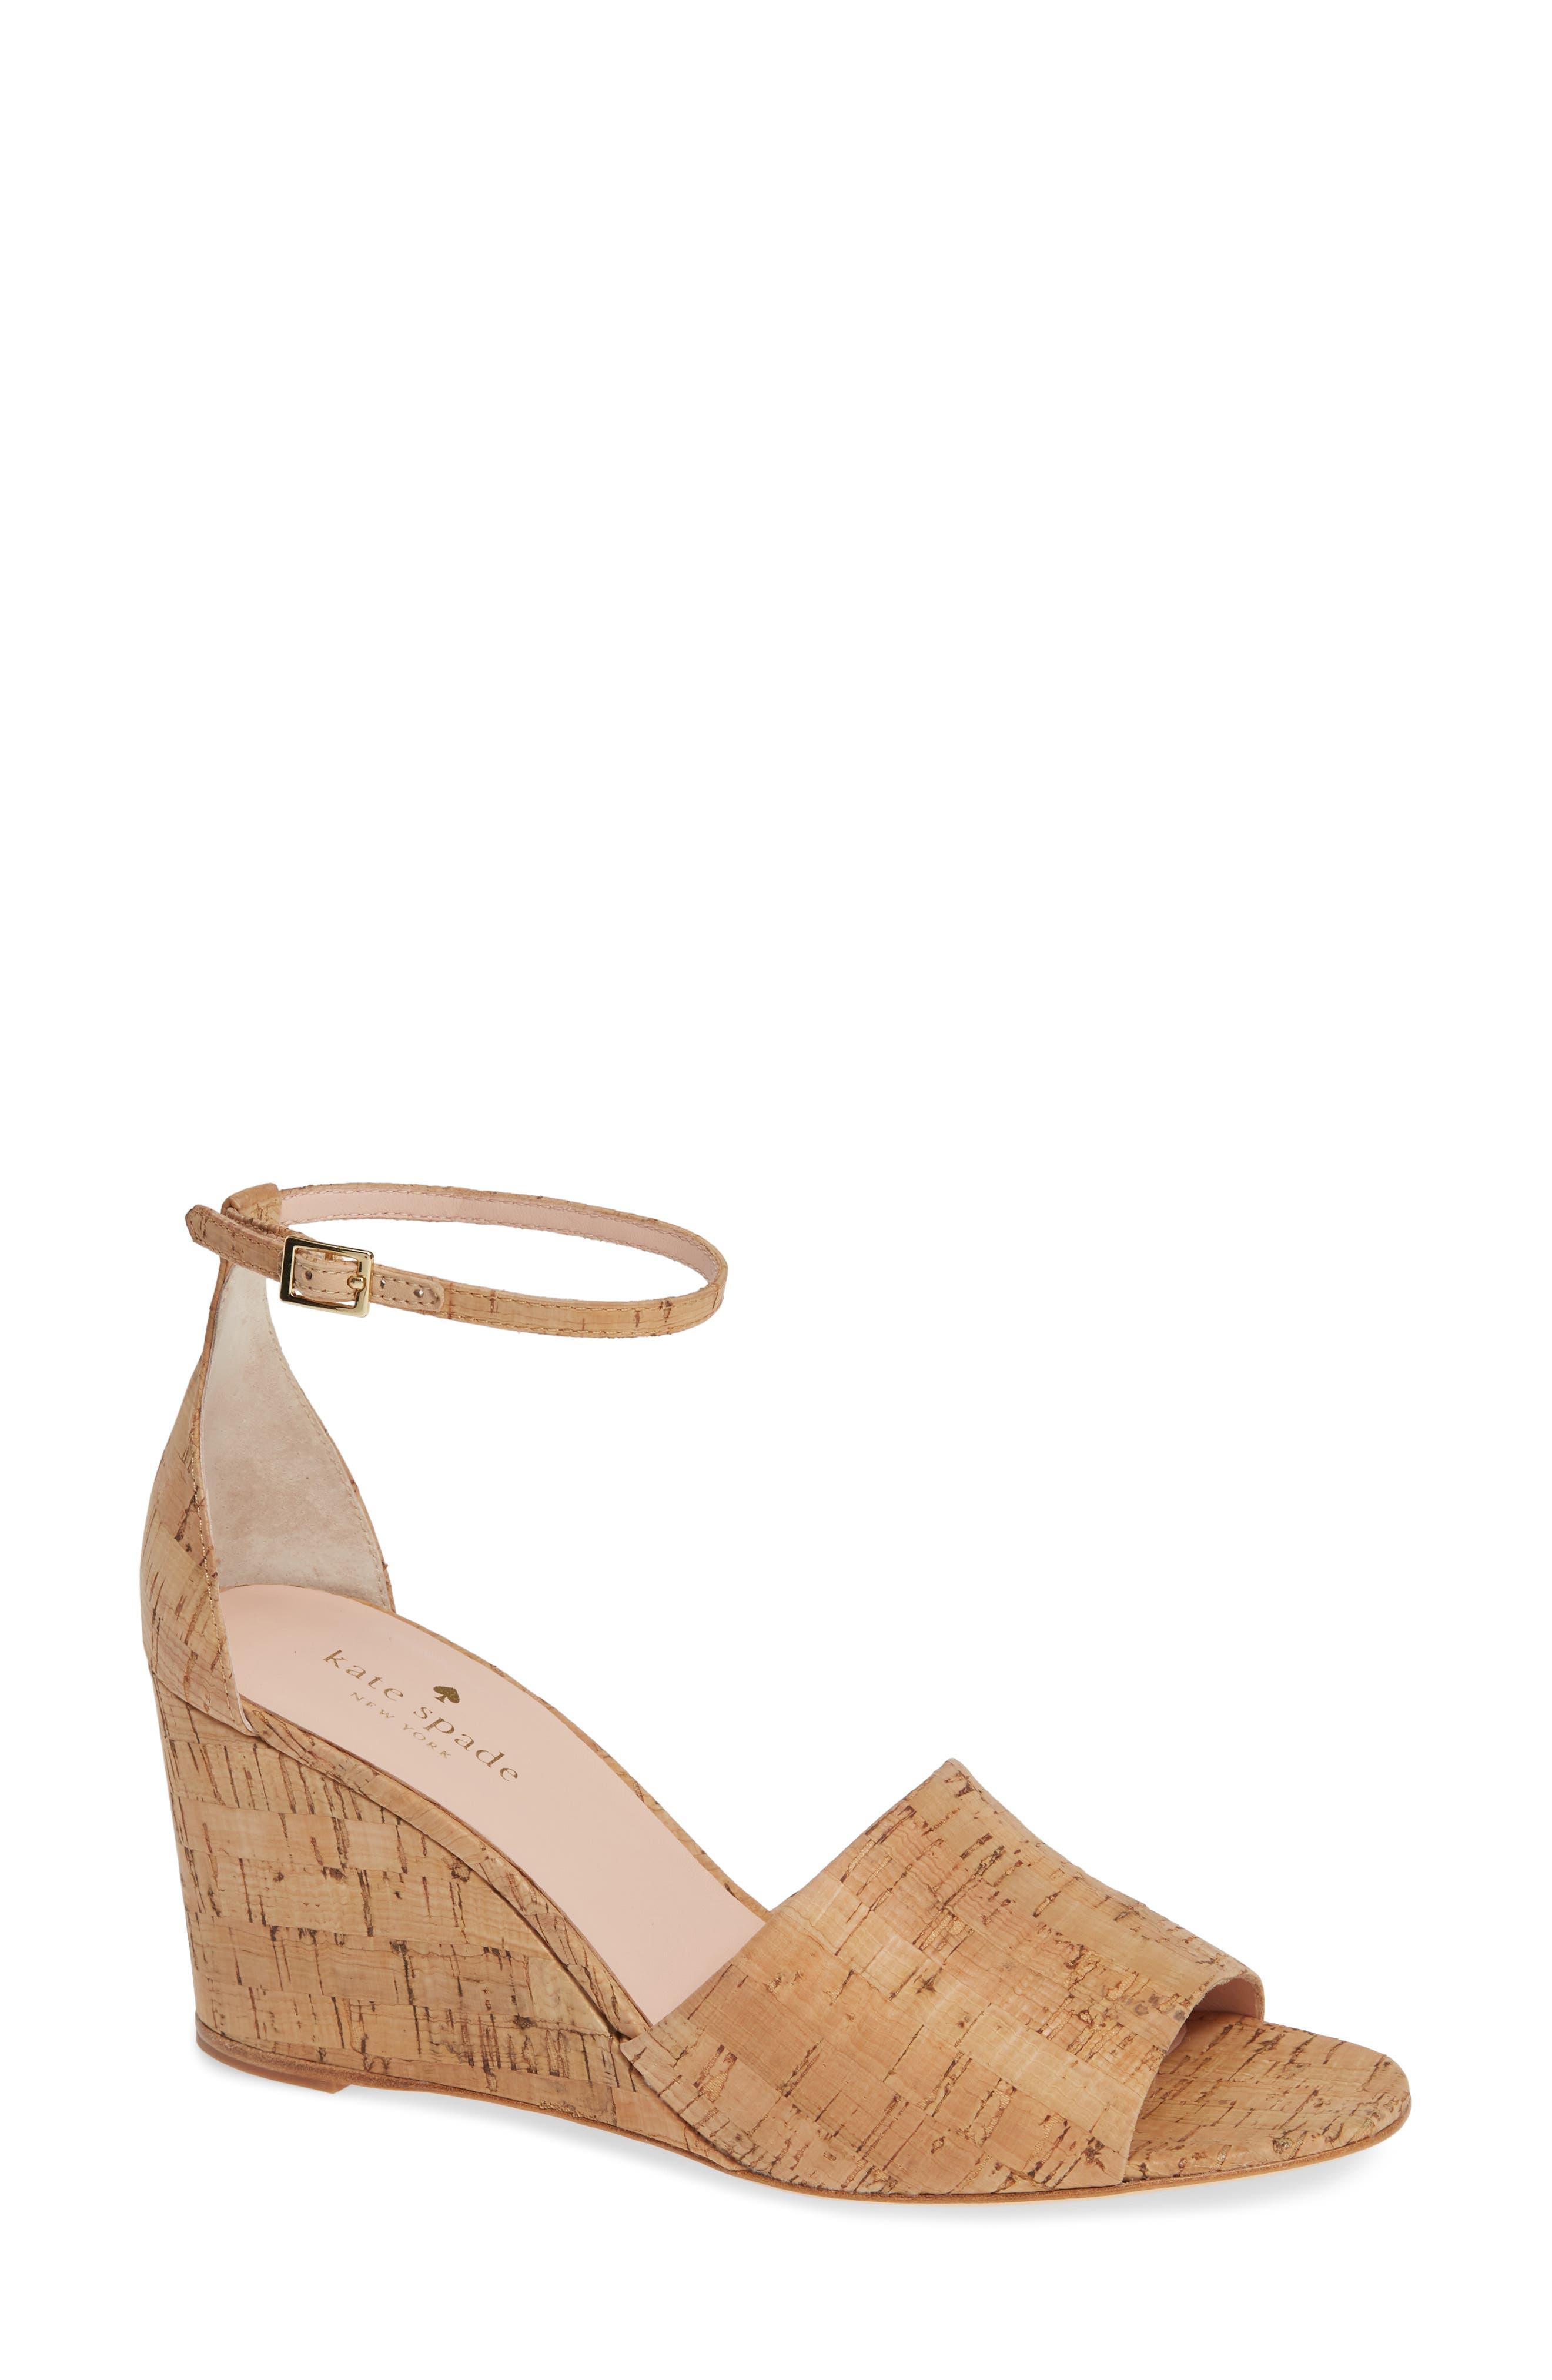 17009930197f Women s Kate Spade New York Wedge Sandals